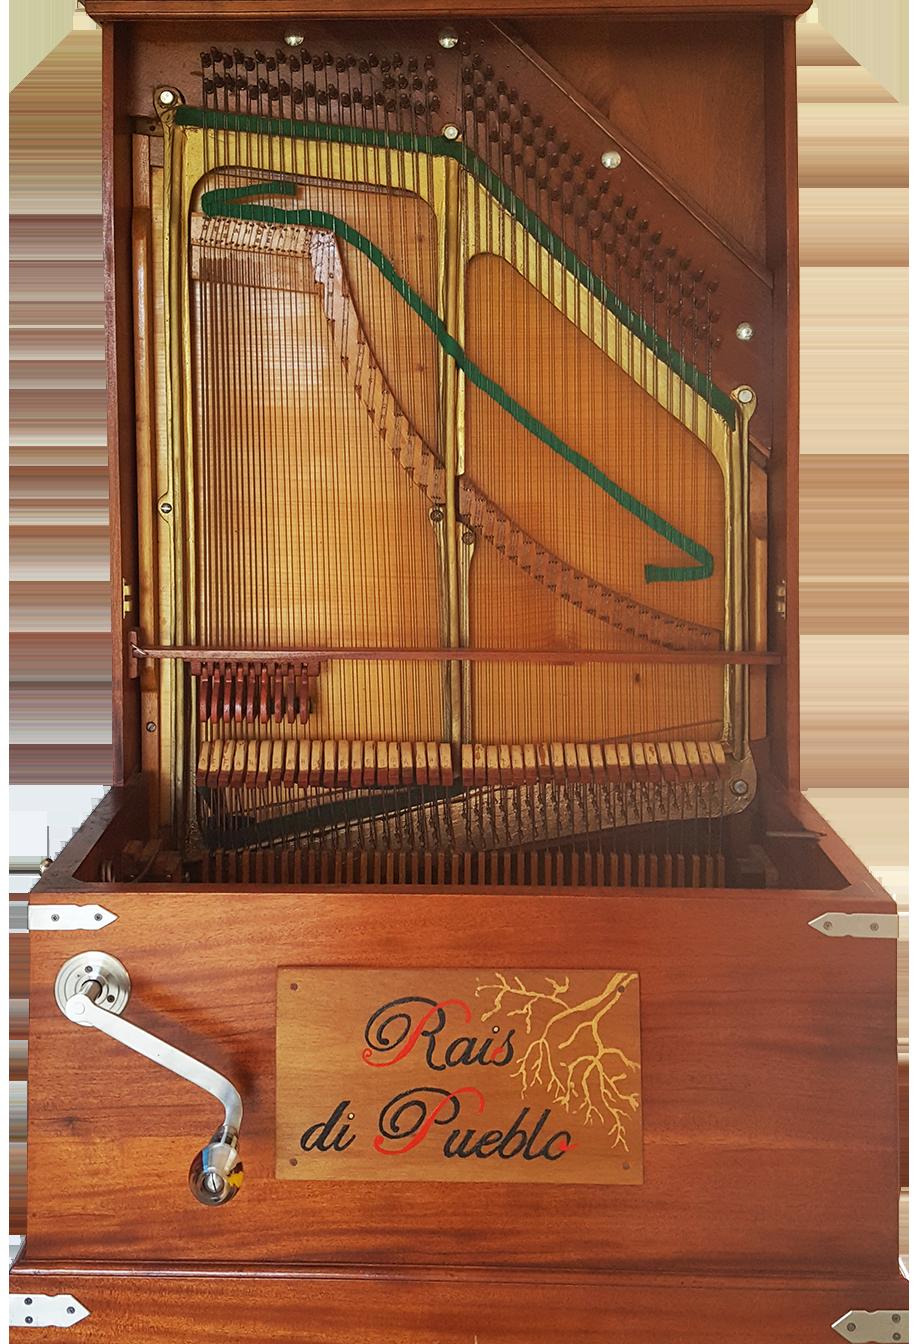 Kaha di orgel | cultureel erfgoed | Splika